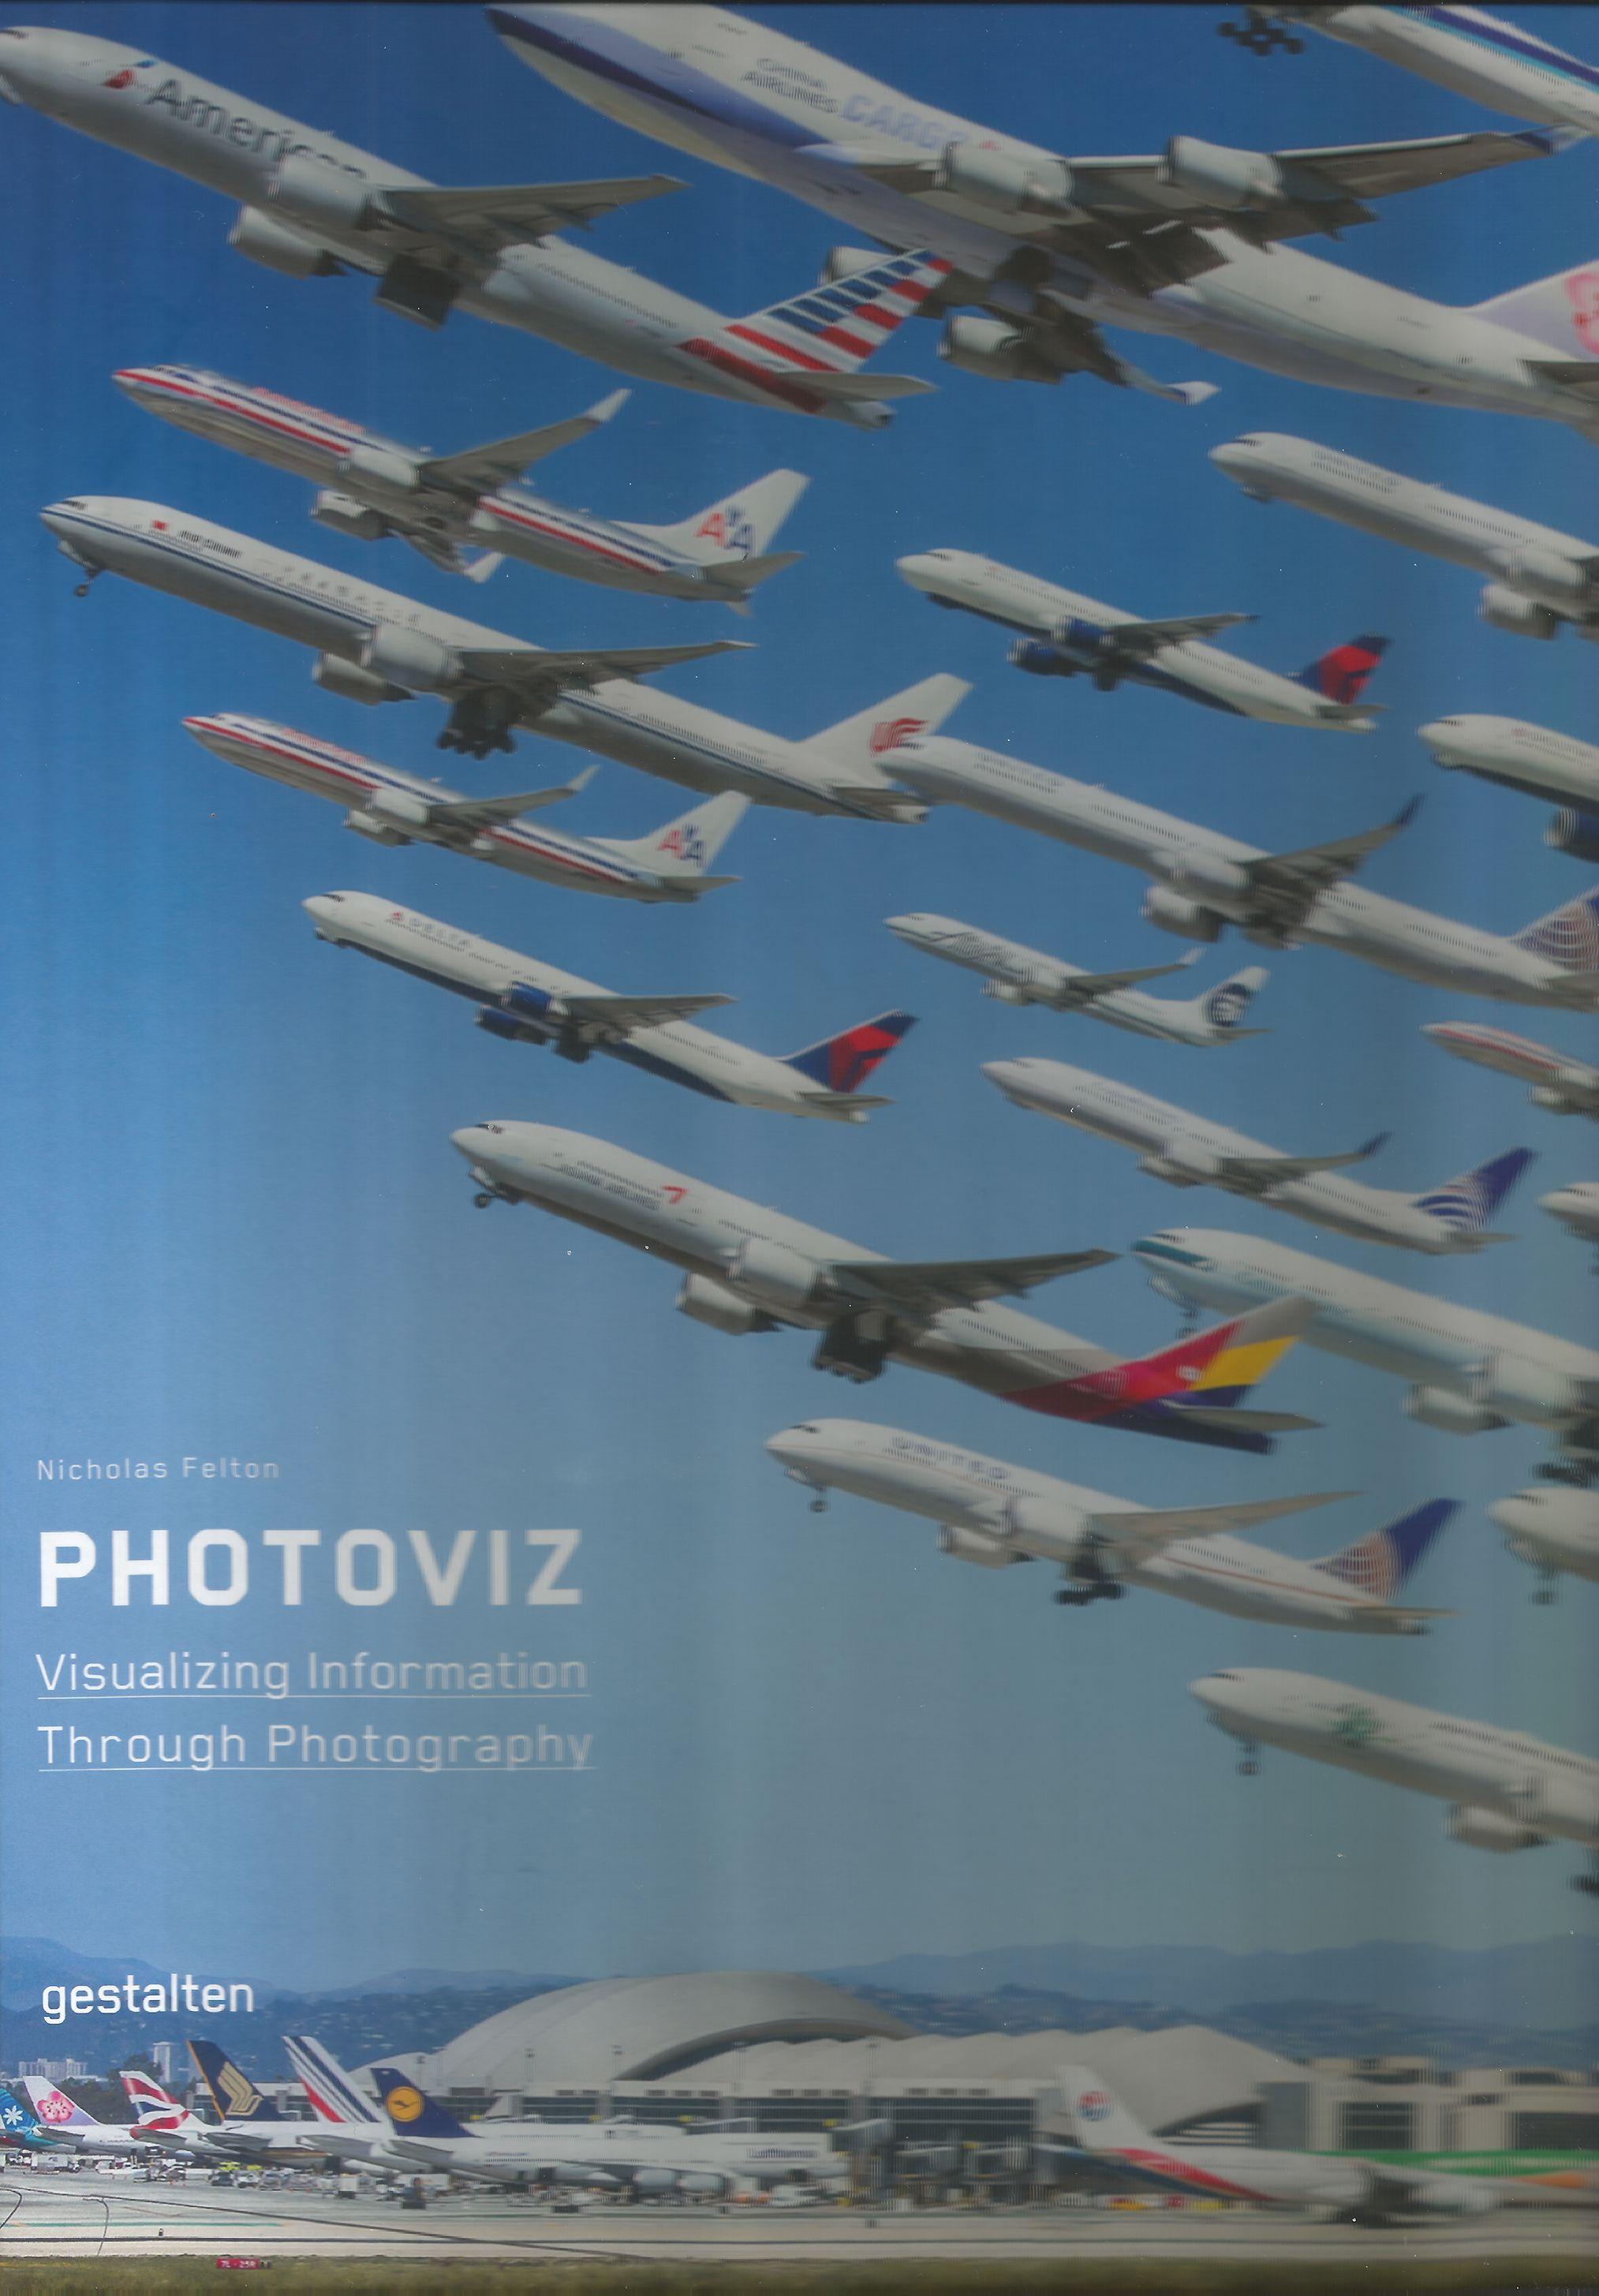 Neural [book review] Photoviz: Visualizing Information through Photography Nicholas Felton Gestalten http://neural.it/2016/08/edited-by-nicholas-felton-photoviz-visualizing-information-through-photography/